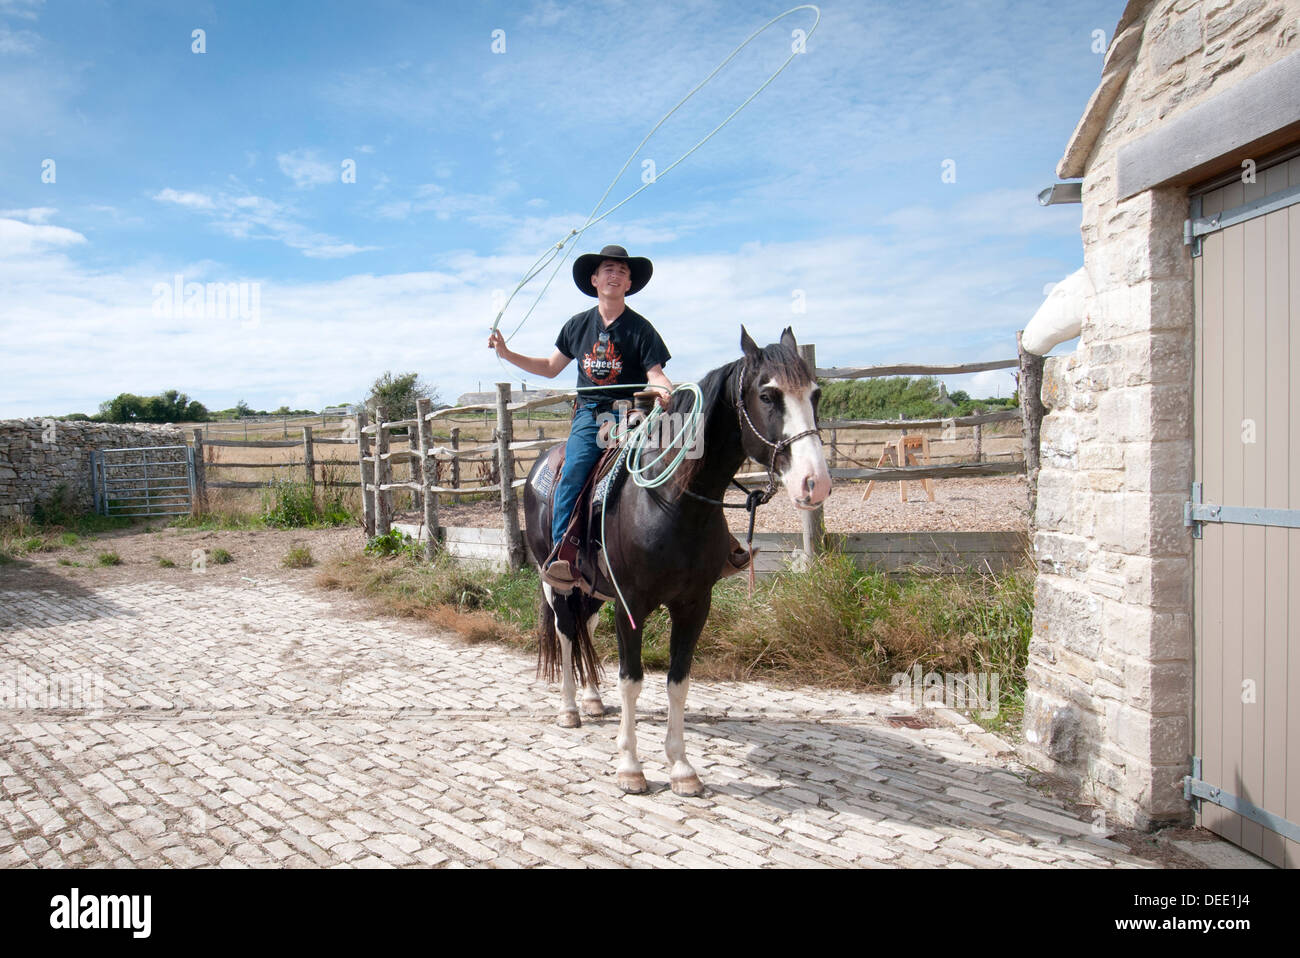 cowboy swinging a lasso - Stock Image